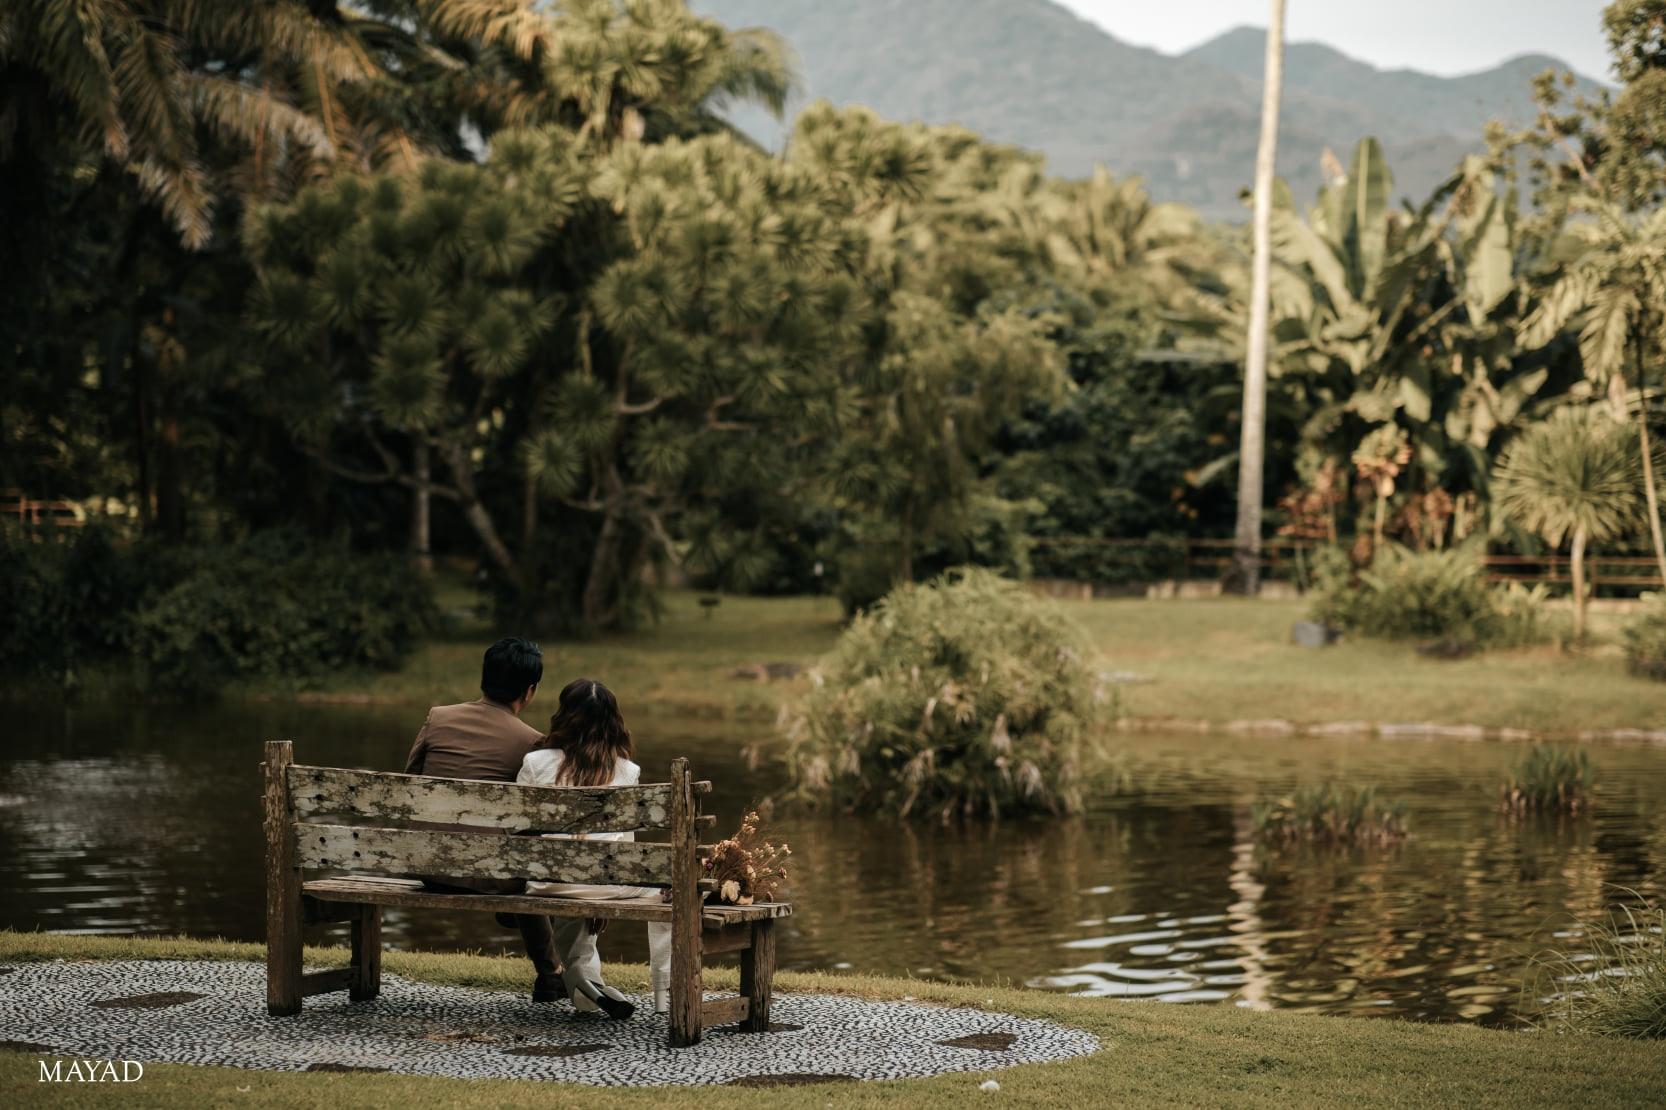 KZ Tandingan and TJ Monterde's garden wedding